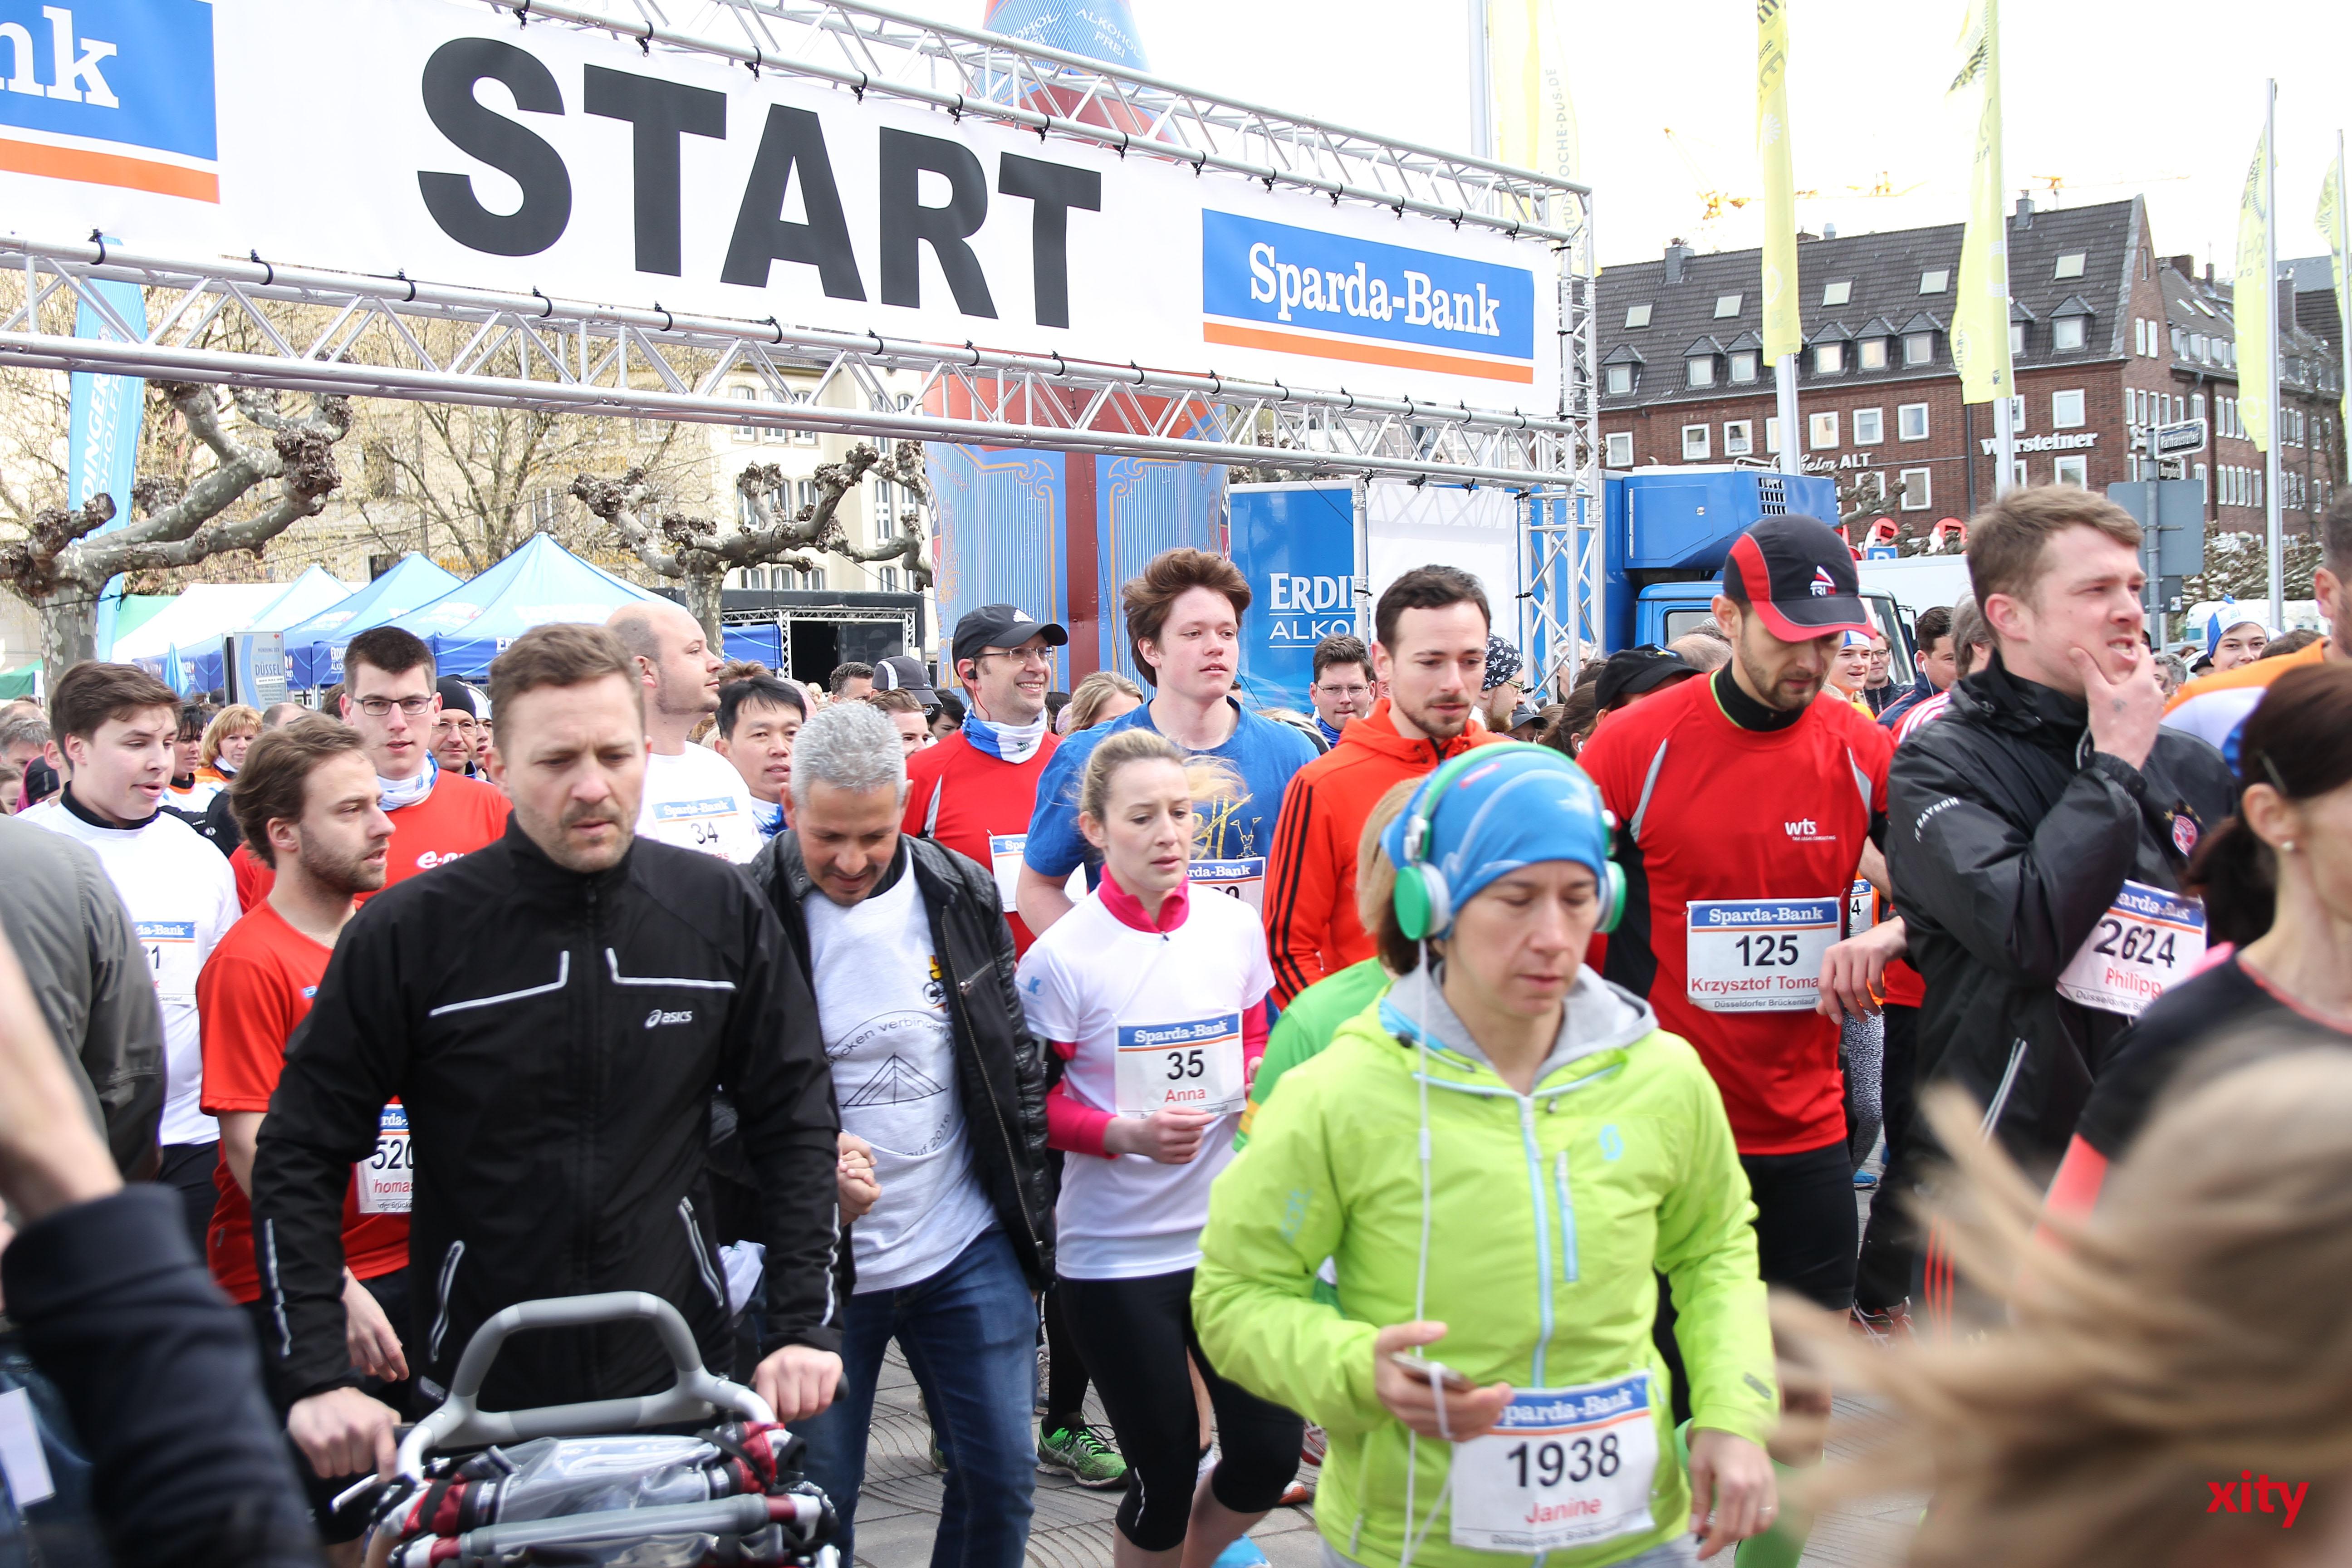 4.600 Teilnehmer liefen bei guten Wetter am Rhein entlang (Foto: xity)